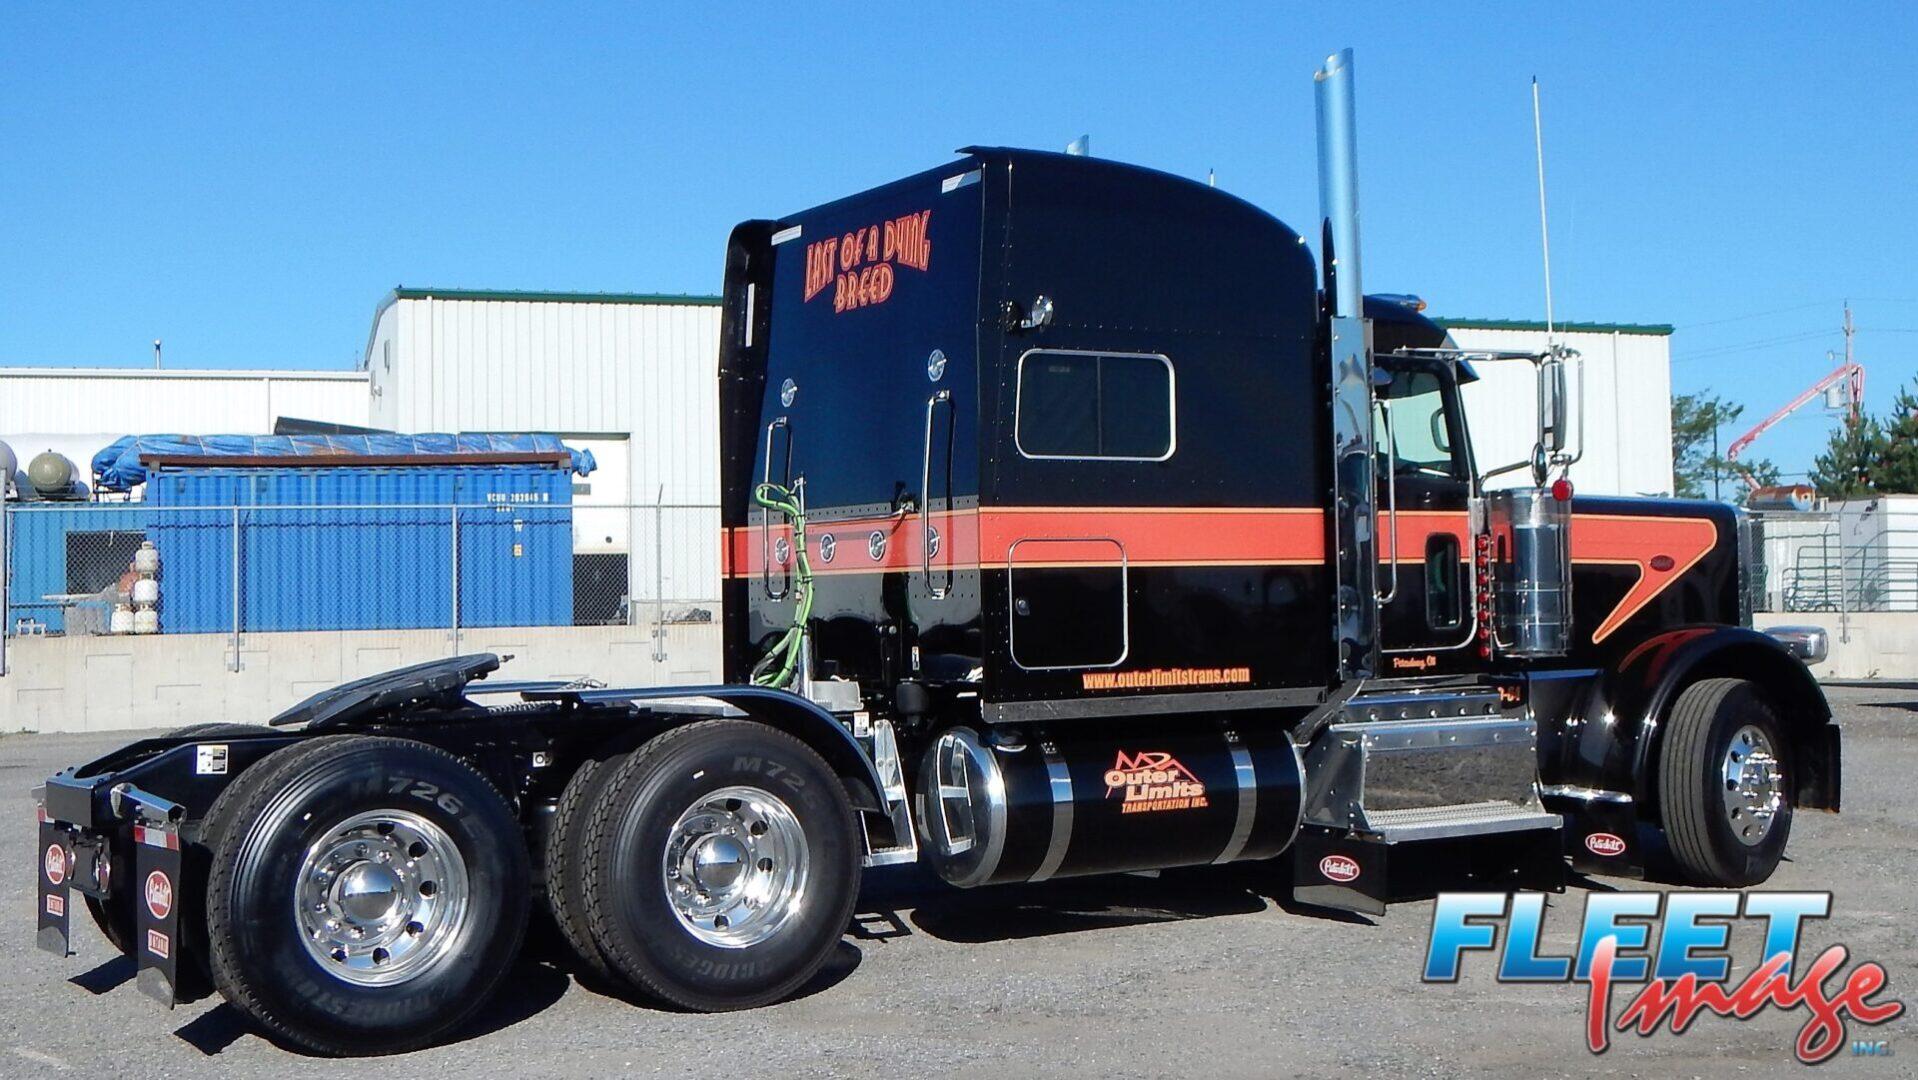 Outer Limited Transportation Inc. black truck